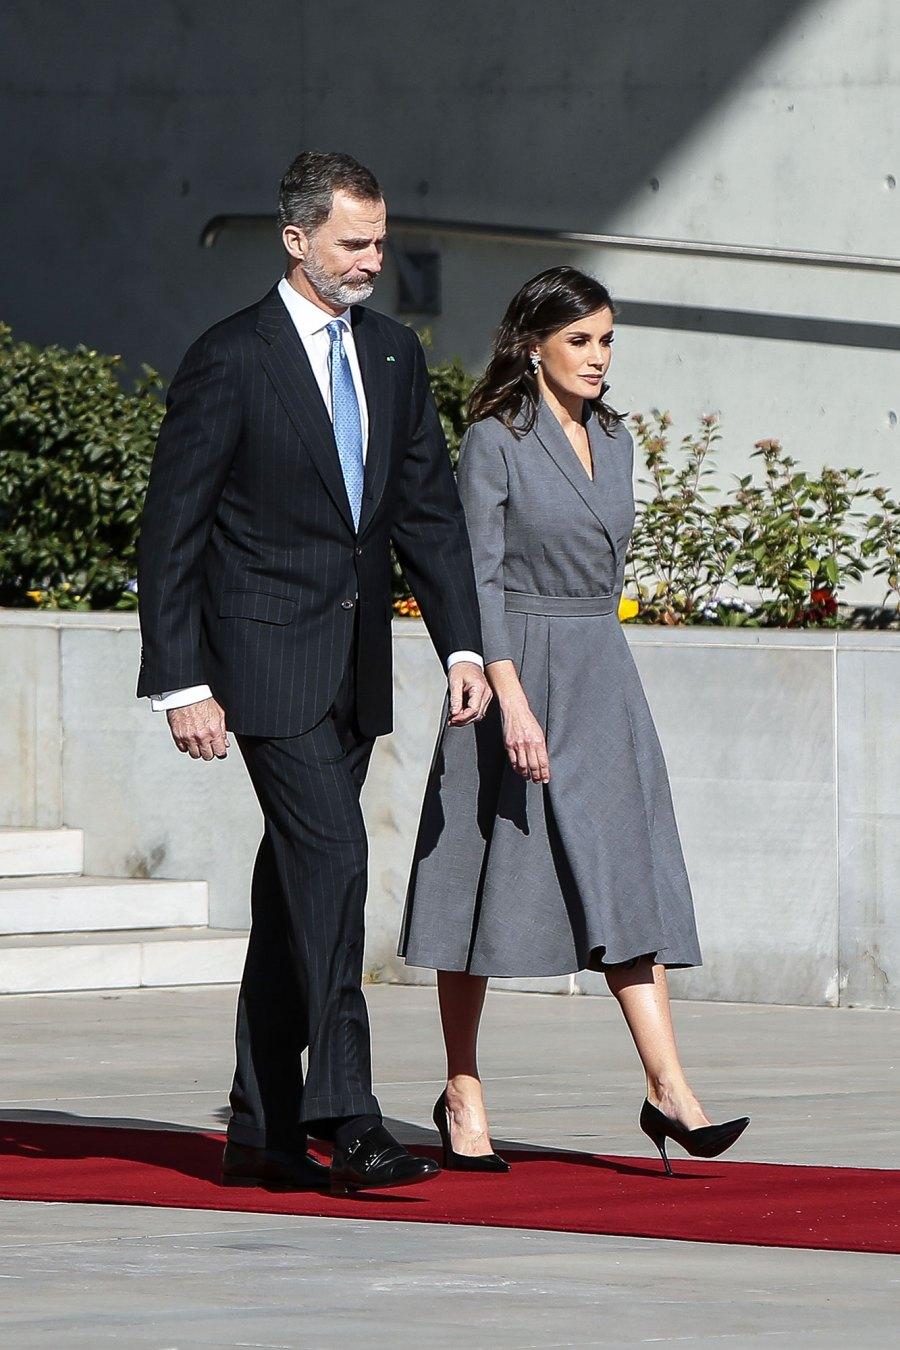 Queen Letizia of Spain (R) and King Felipe VI